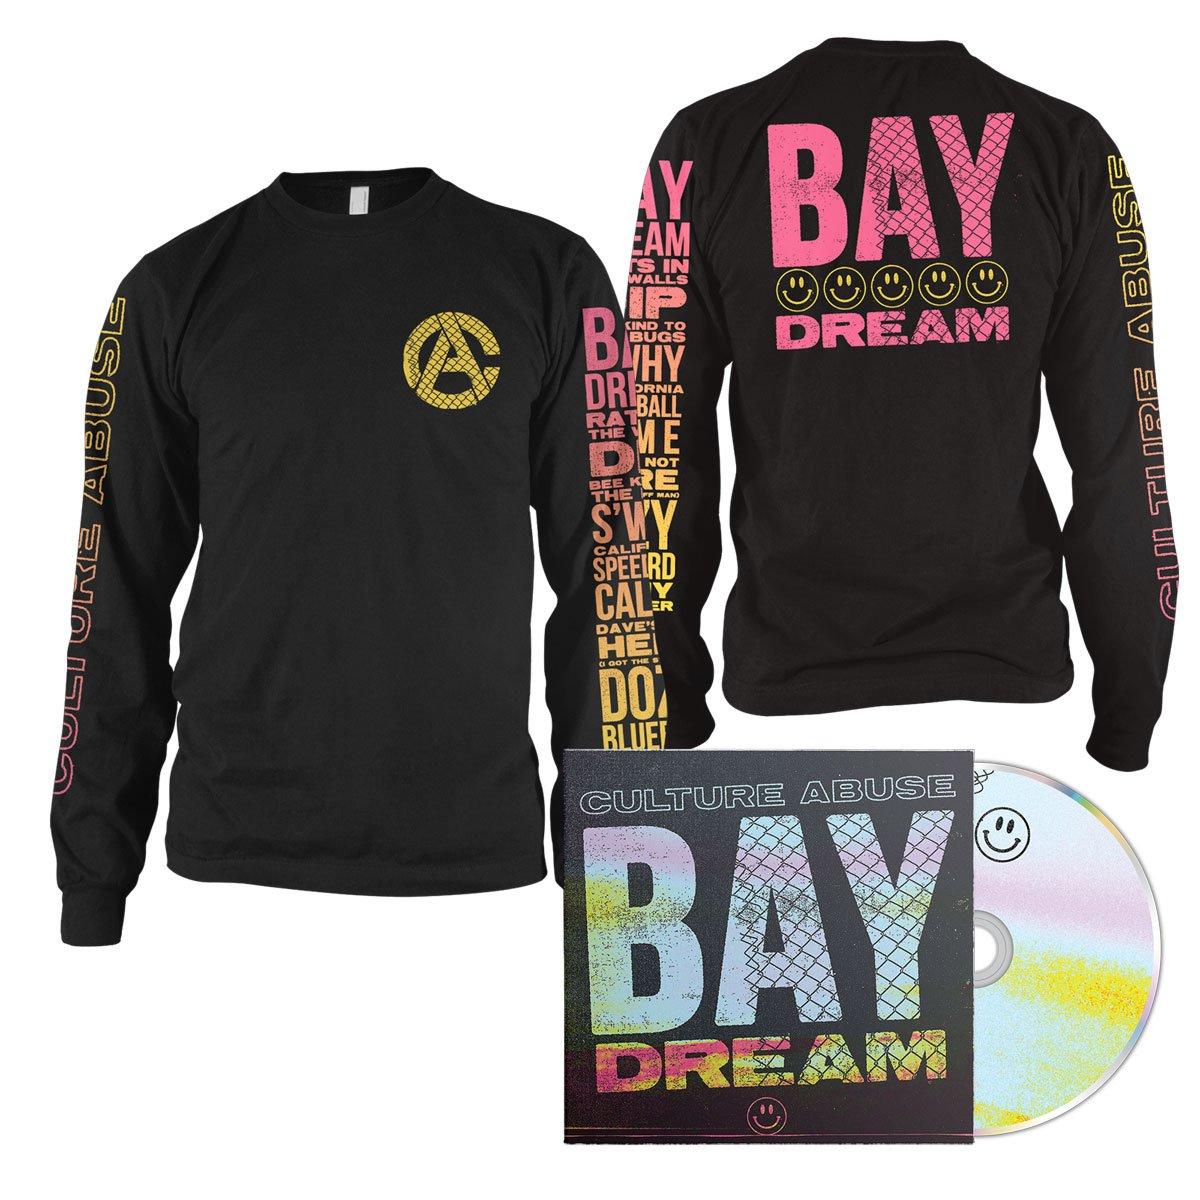 IMAGE | Bay Dream CD + Smile Long Sleeve (Black) Bundle